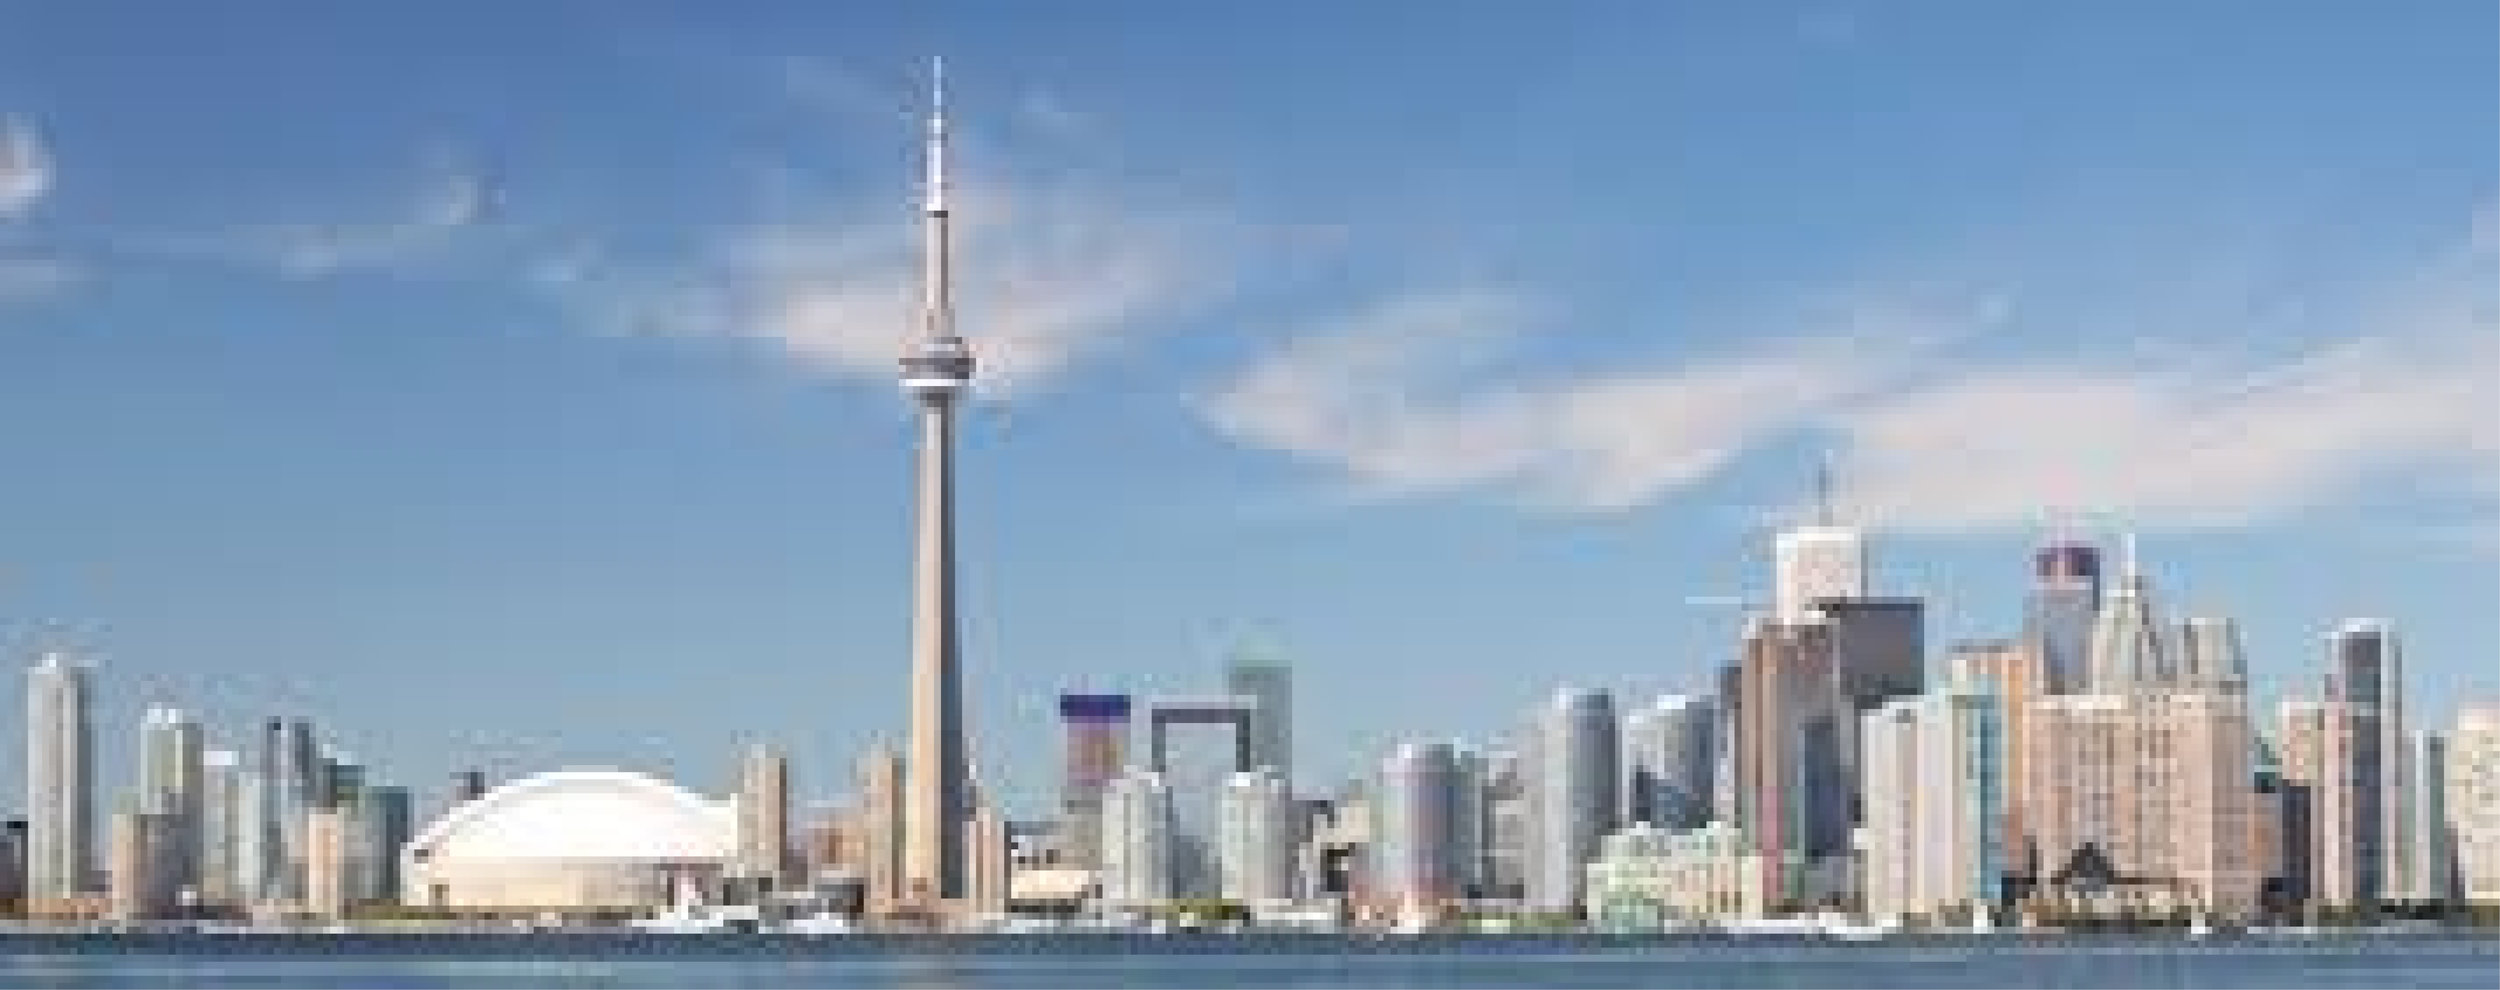 Skyline of Toronto, Ontario   the site of Toronto Emmanuel Church